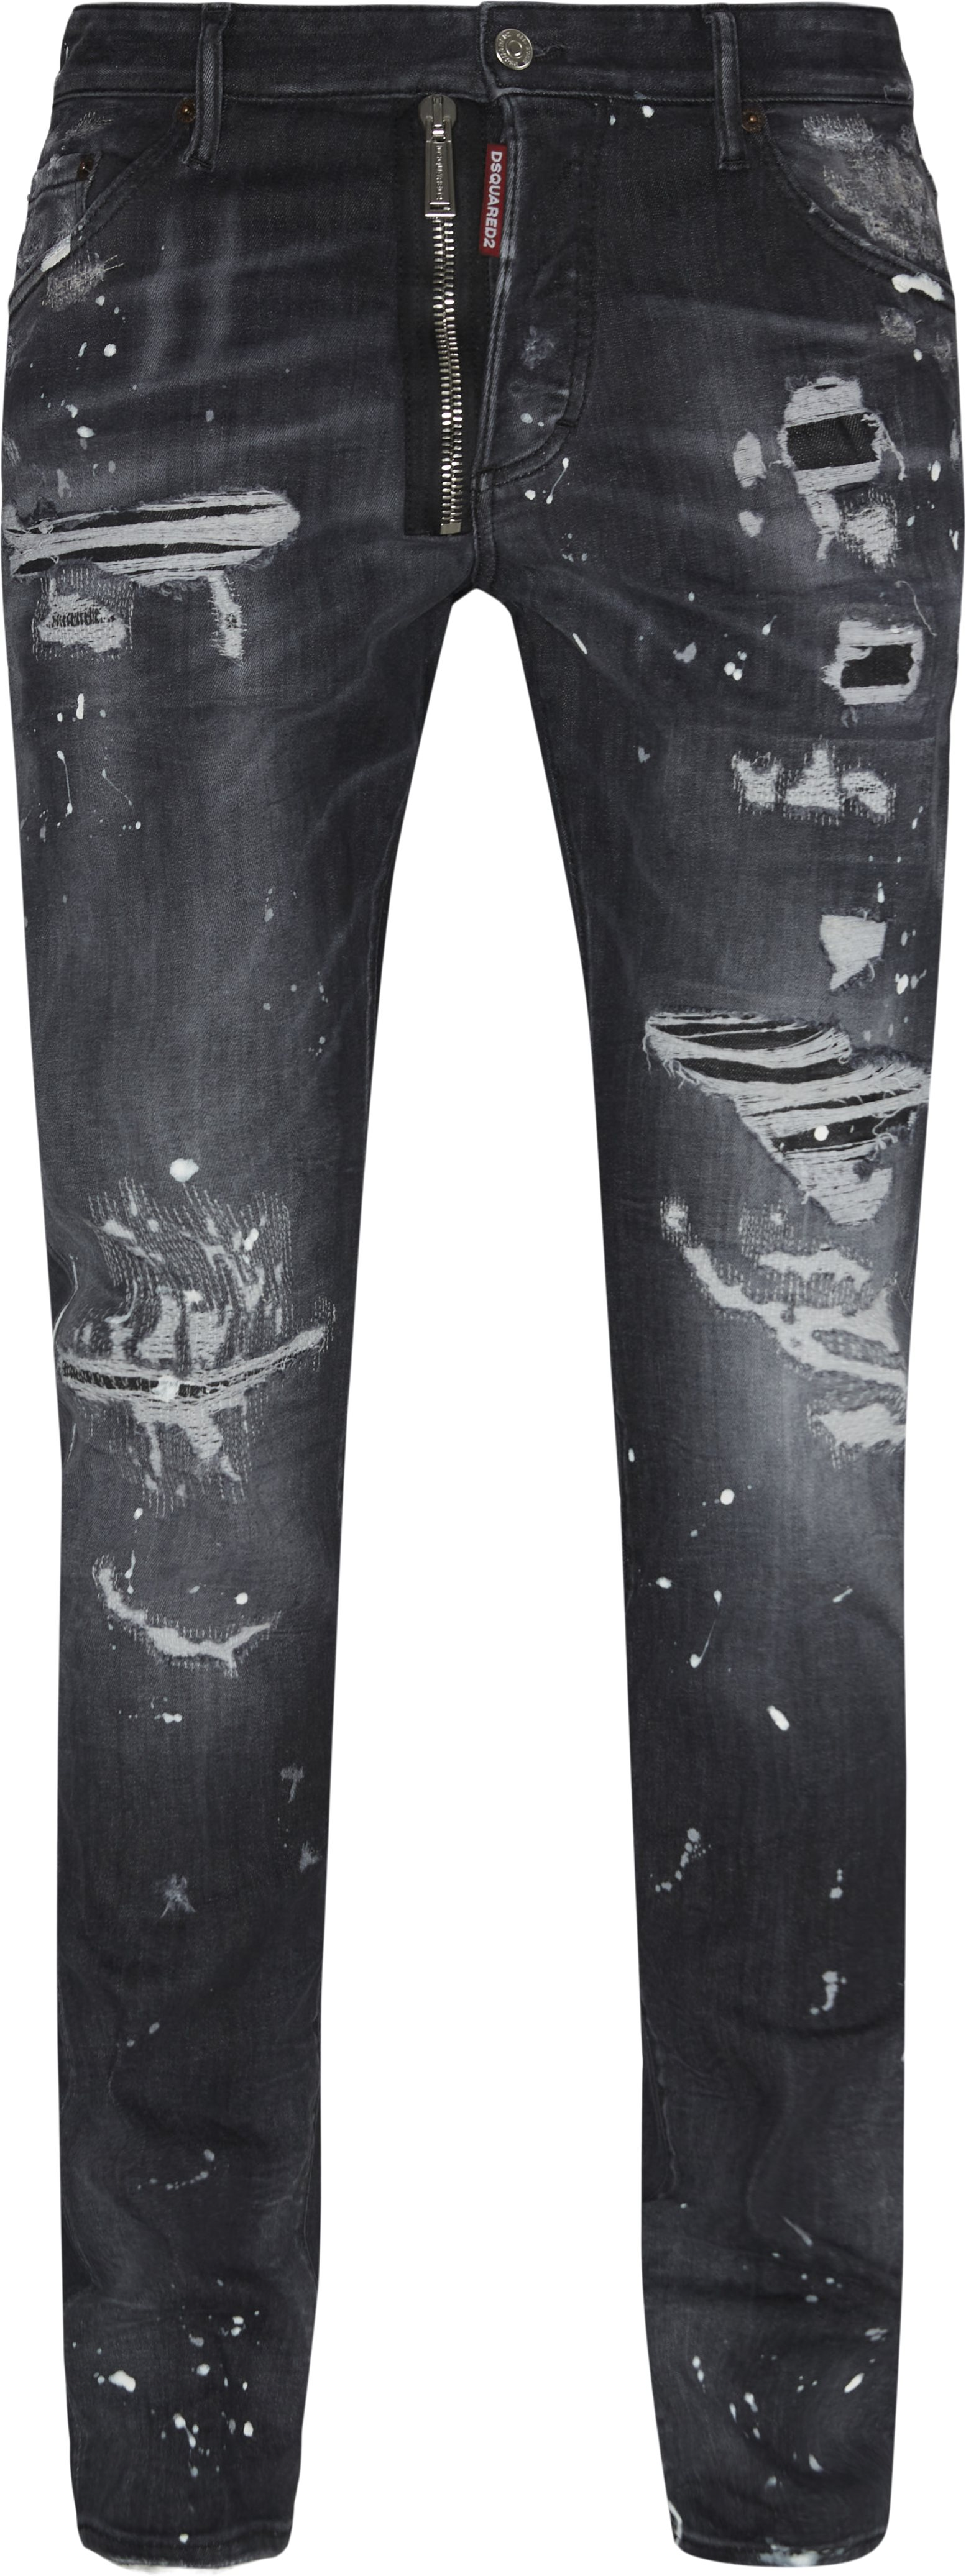 Cool Guy Jeans - Jeans - Slim fit - Sort